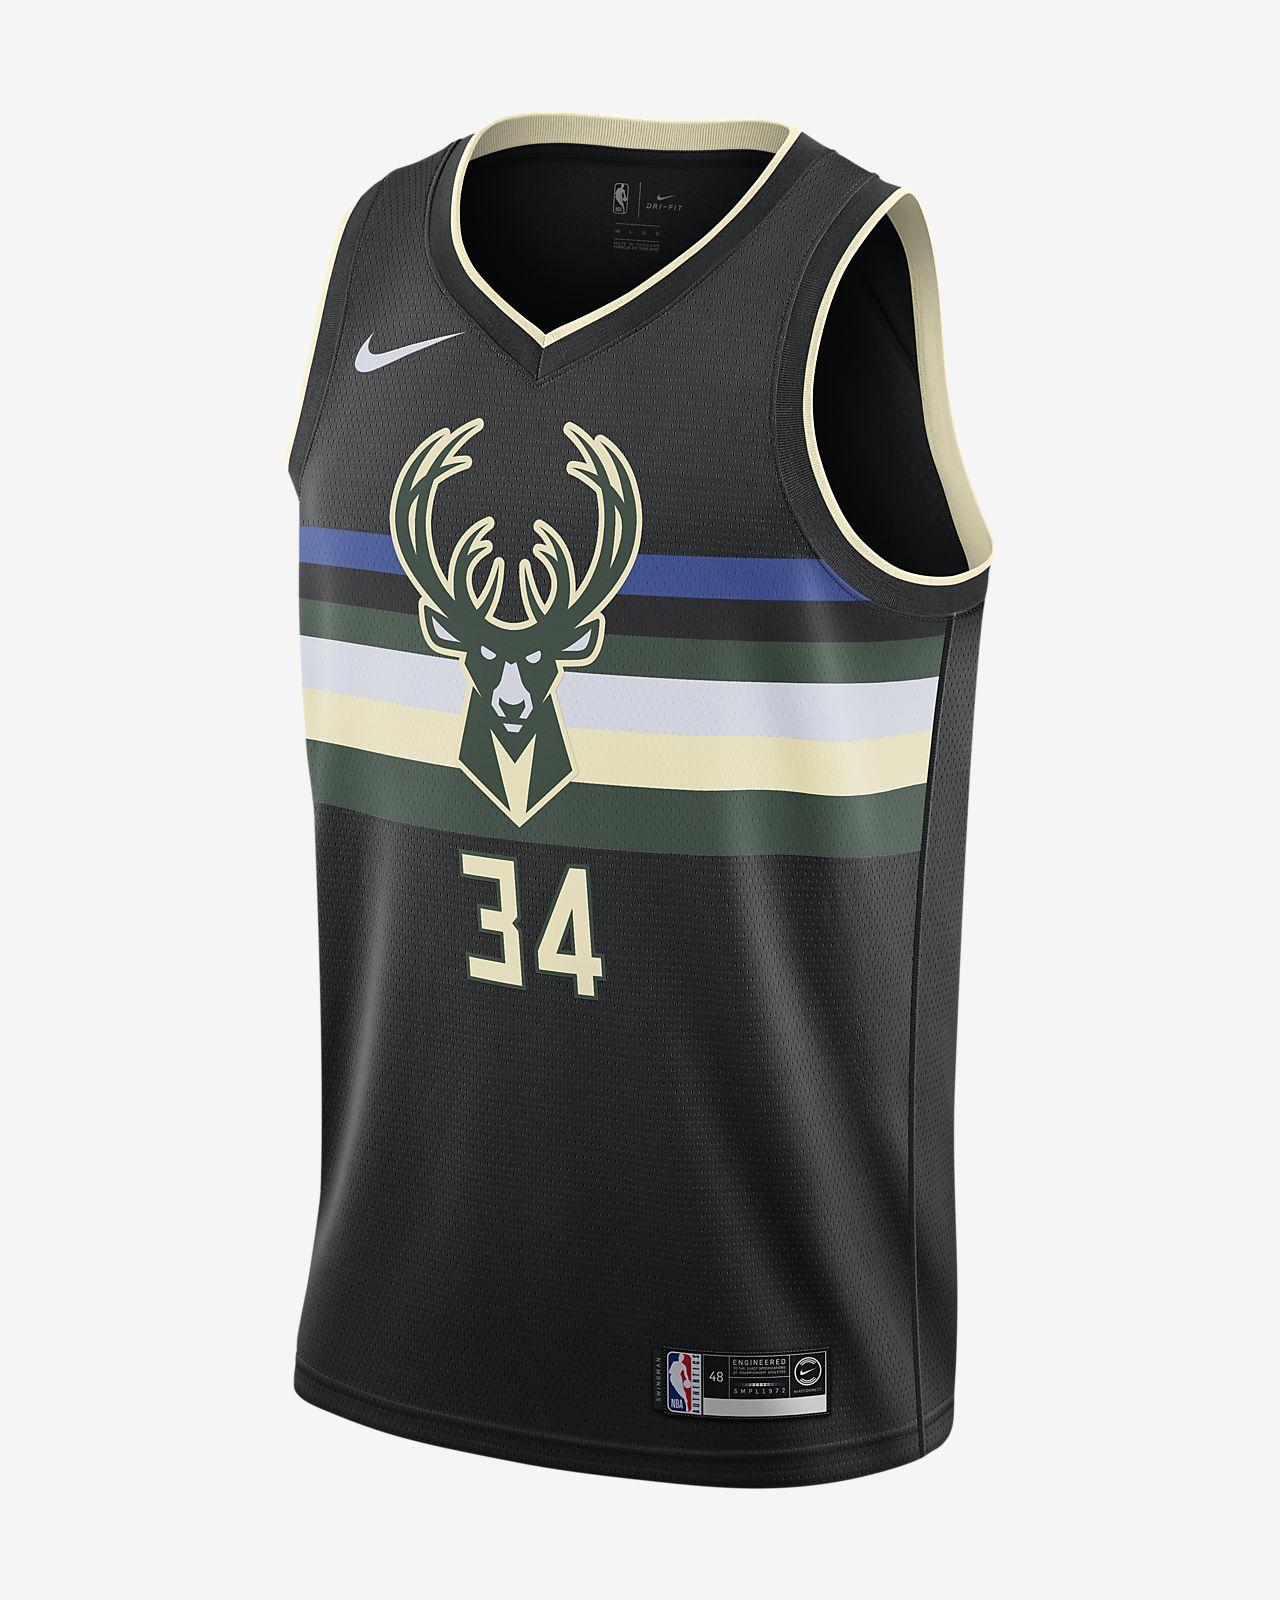 Dres Nike NBA Swingman Giannis Antetokounmpo Bucks Statement Edition